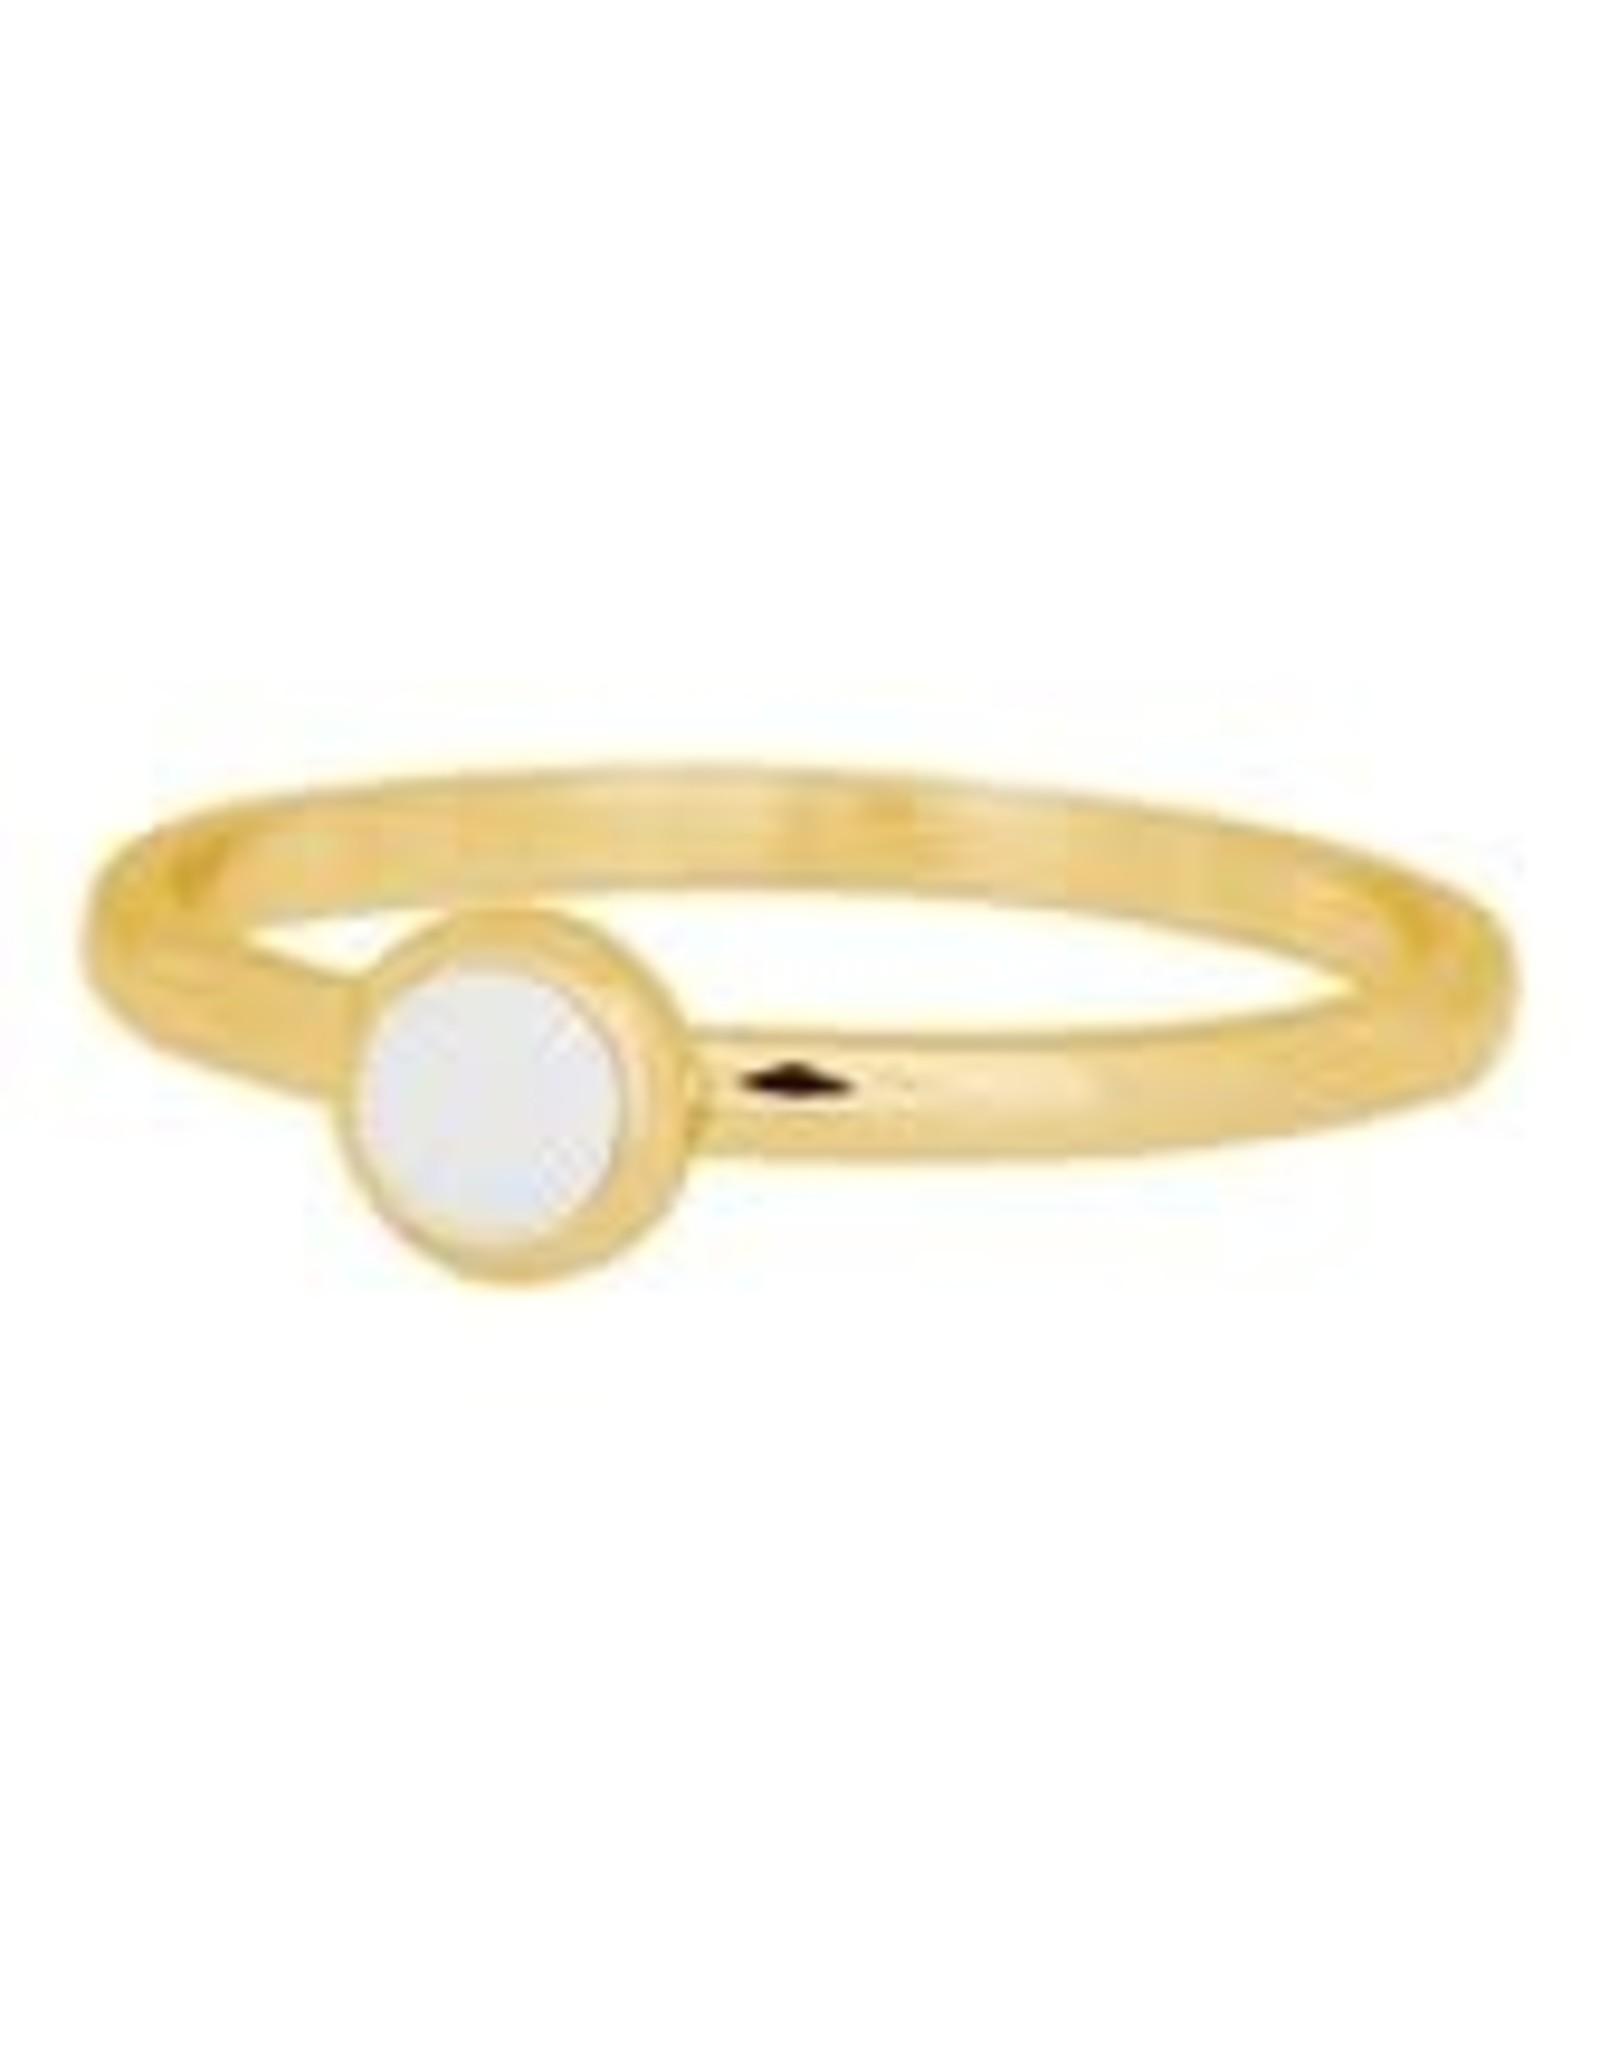 IXXXI IXXXI 1 Zirconia ring Gold